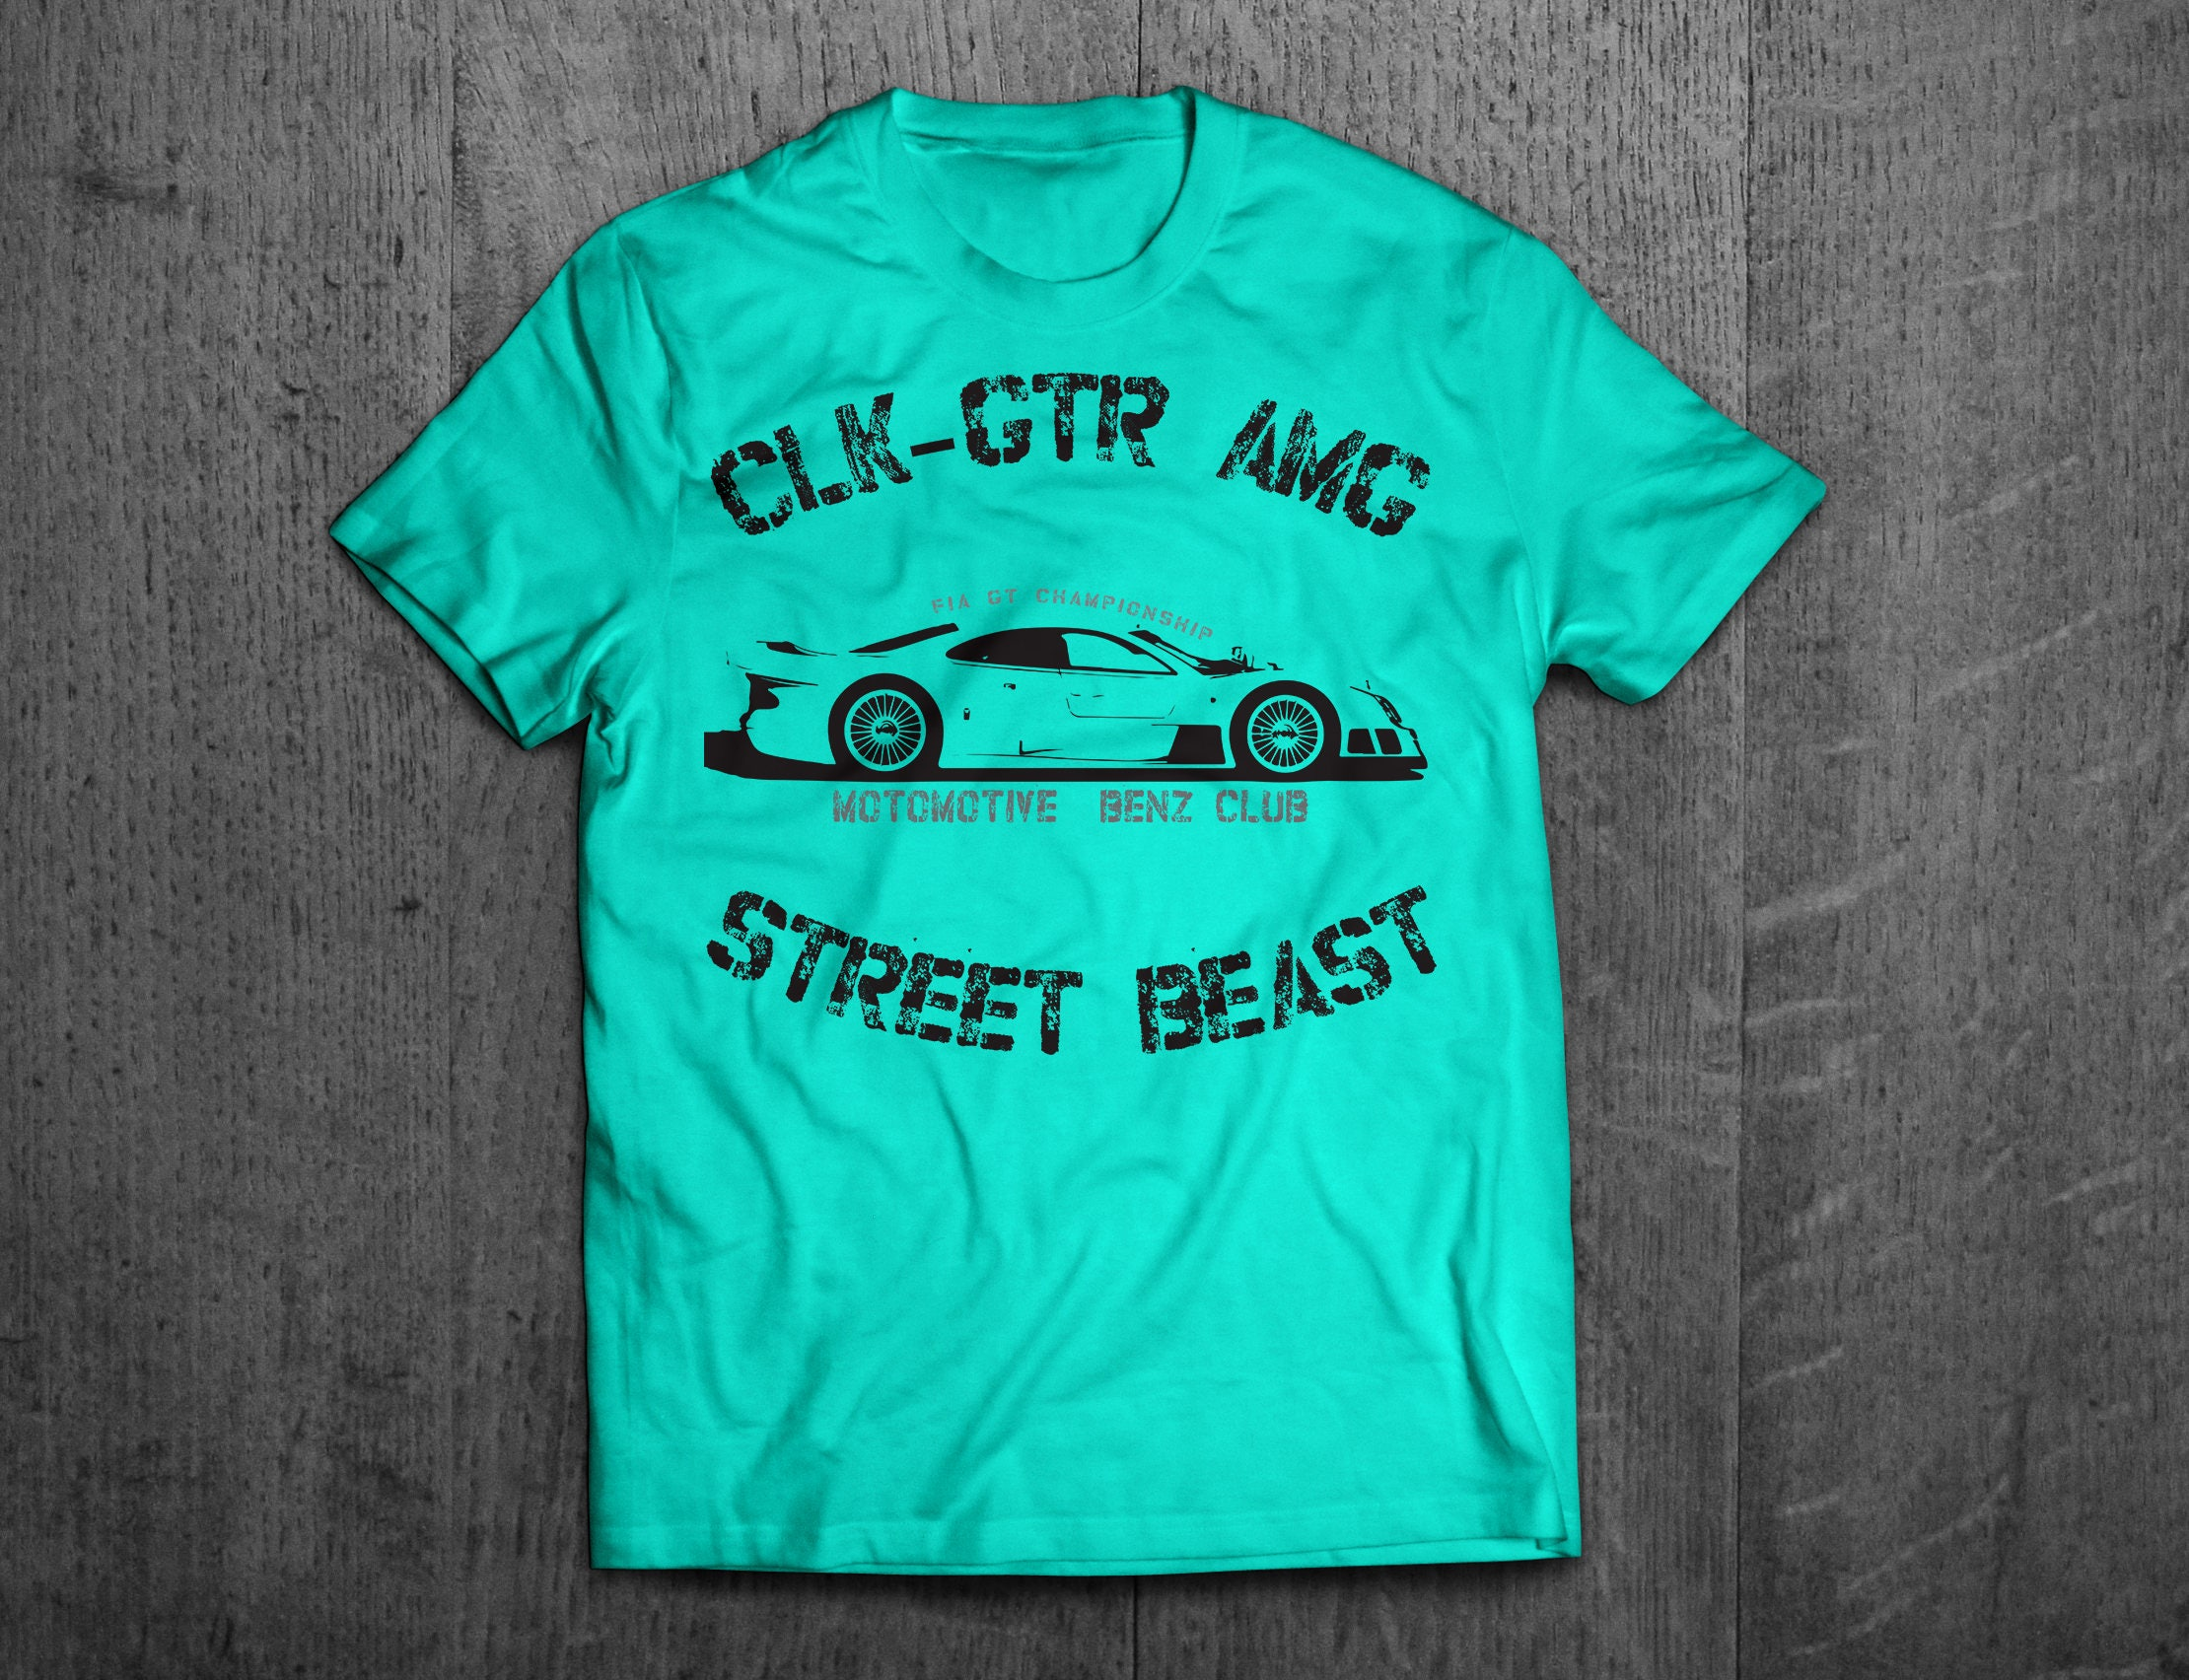 Mercedes amg shirts mercedes clk gtr t shirts cars t for Mercedes benz t shirt